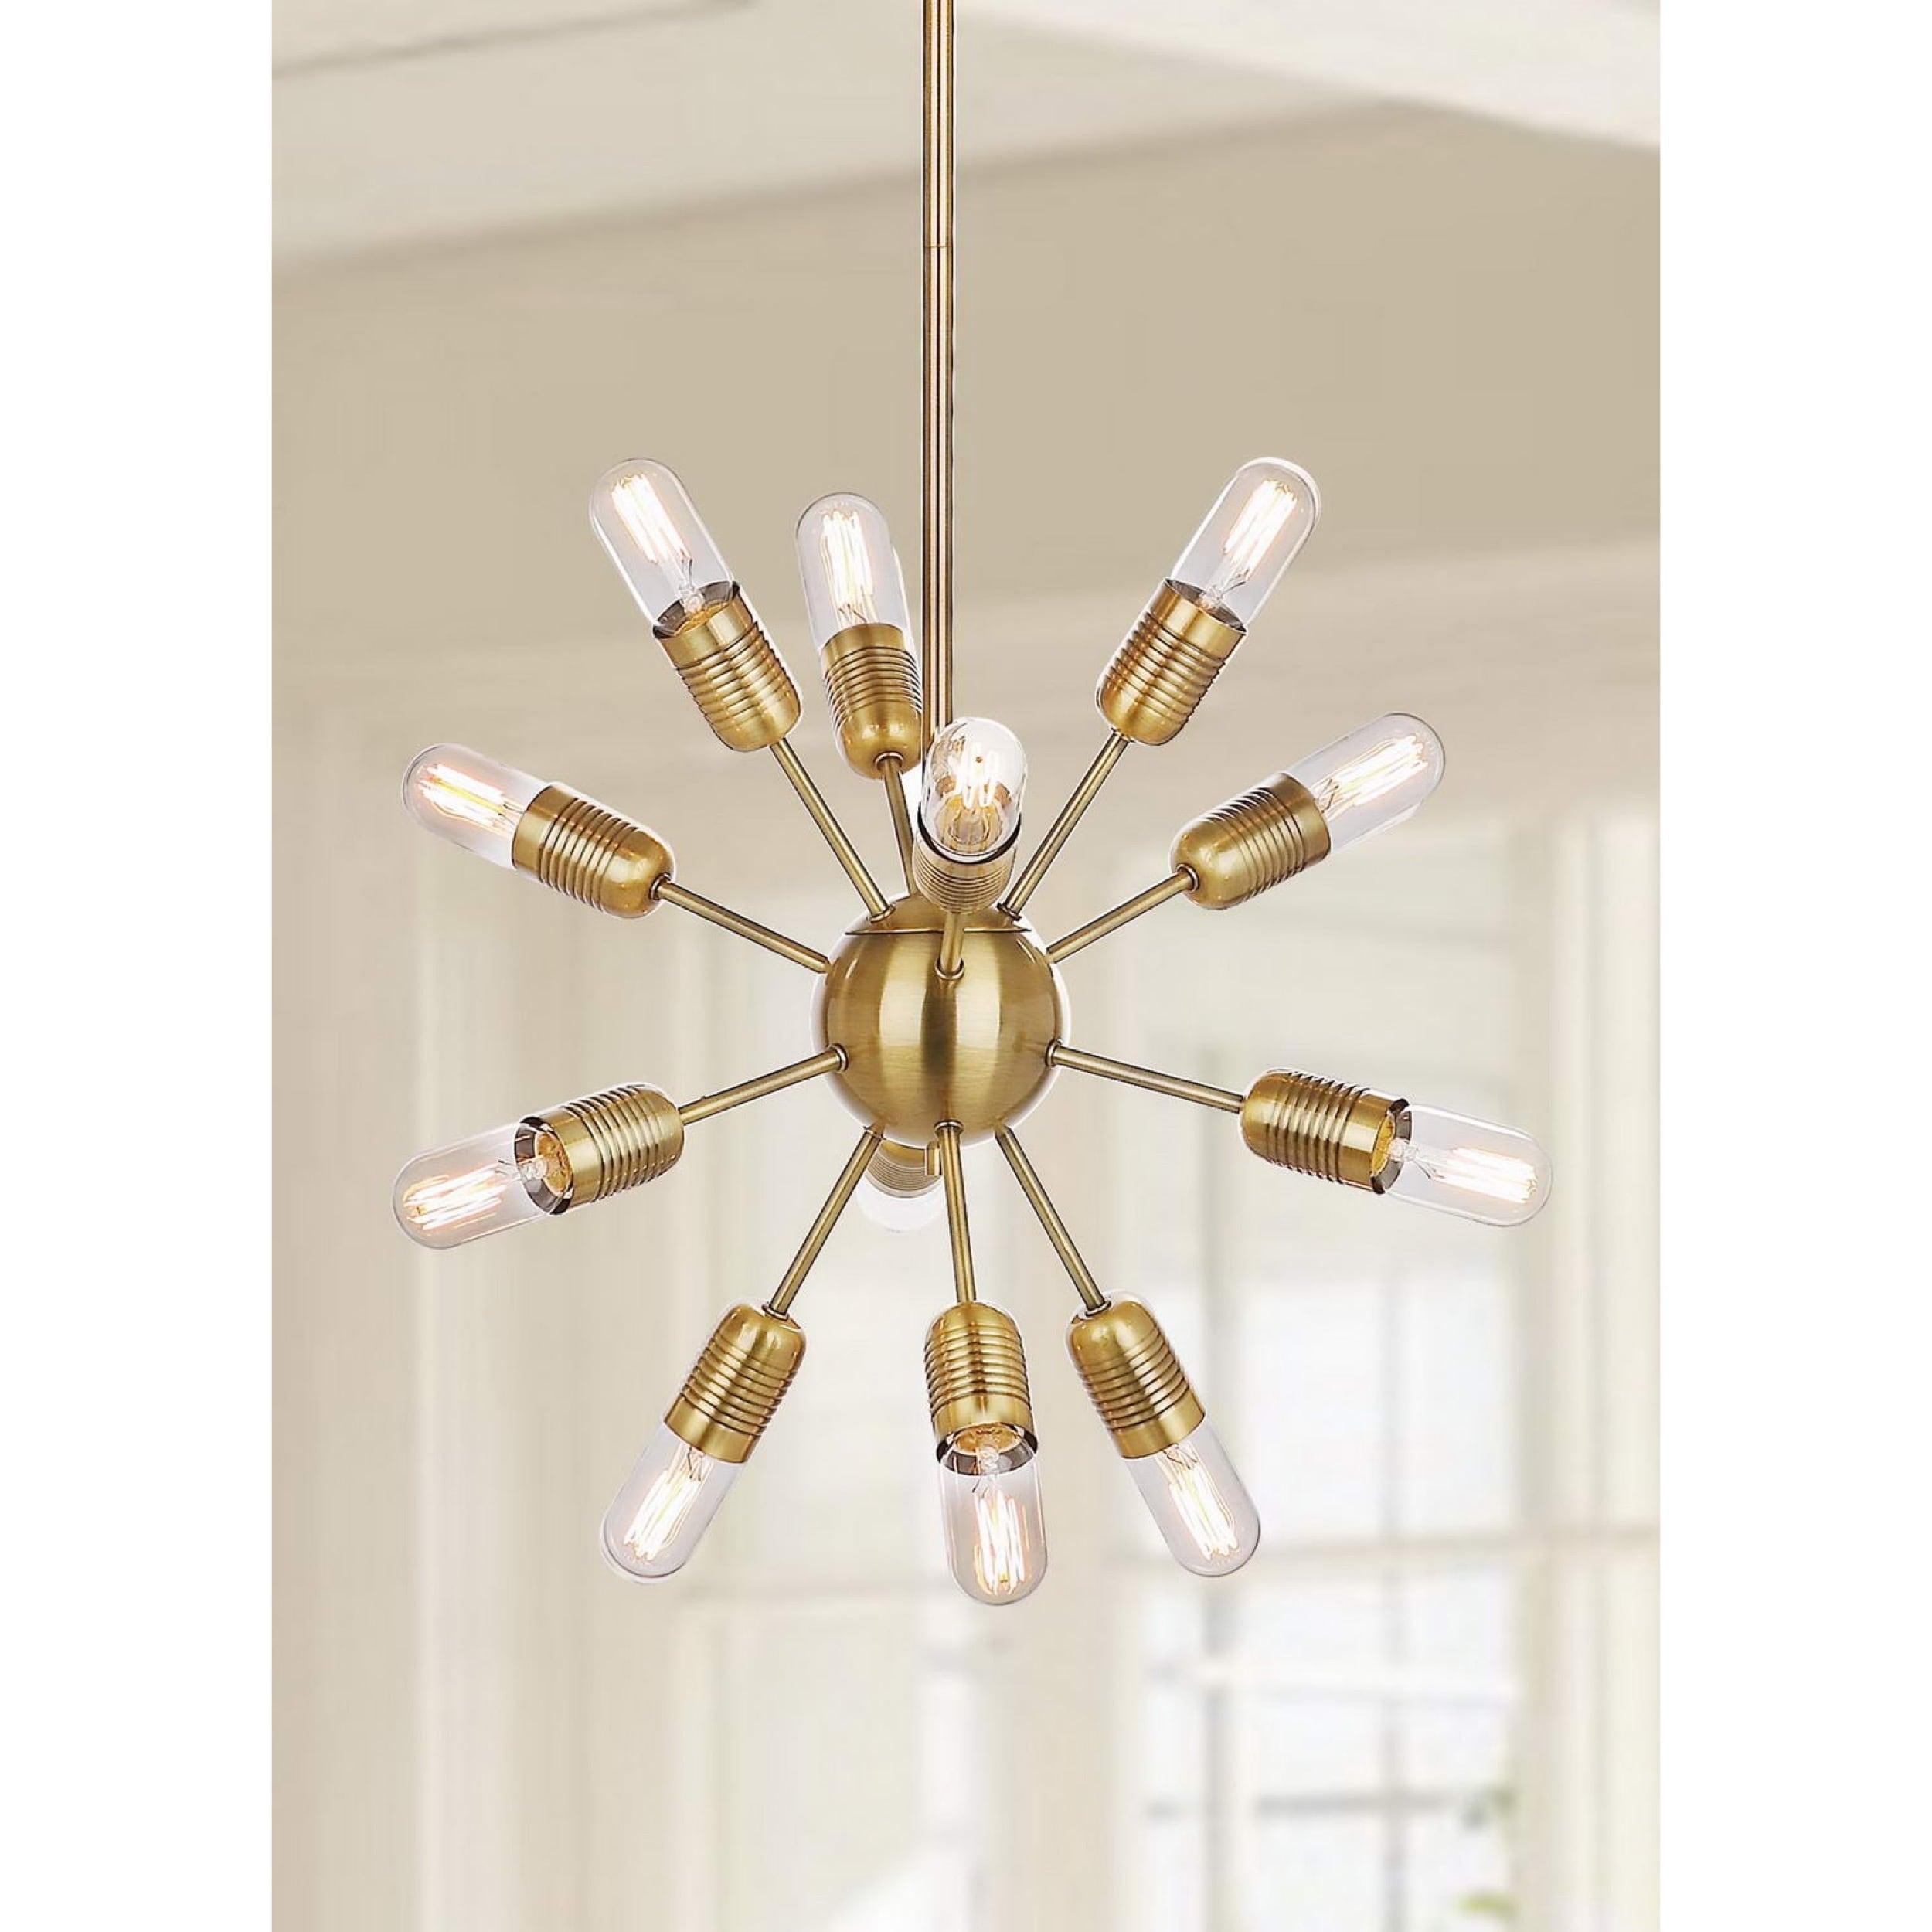 Safavieh Lighting Raging 12 light Gold 17 5 inch Edison Bulb